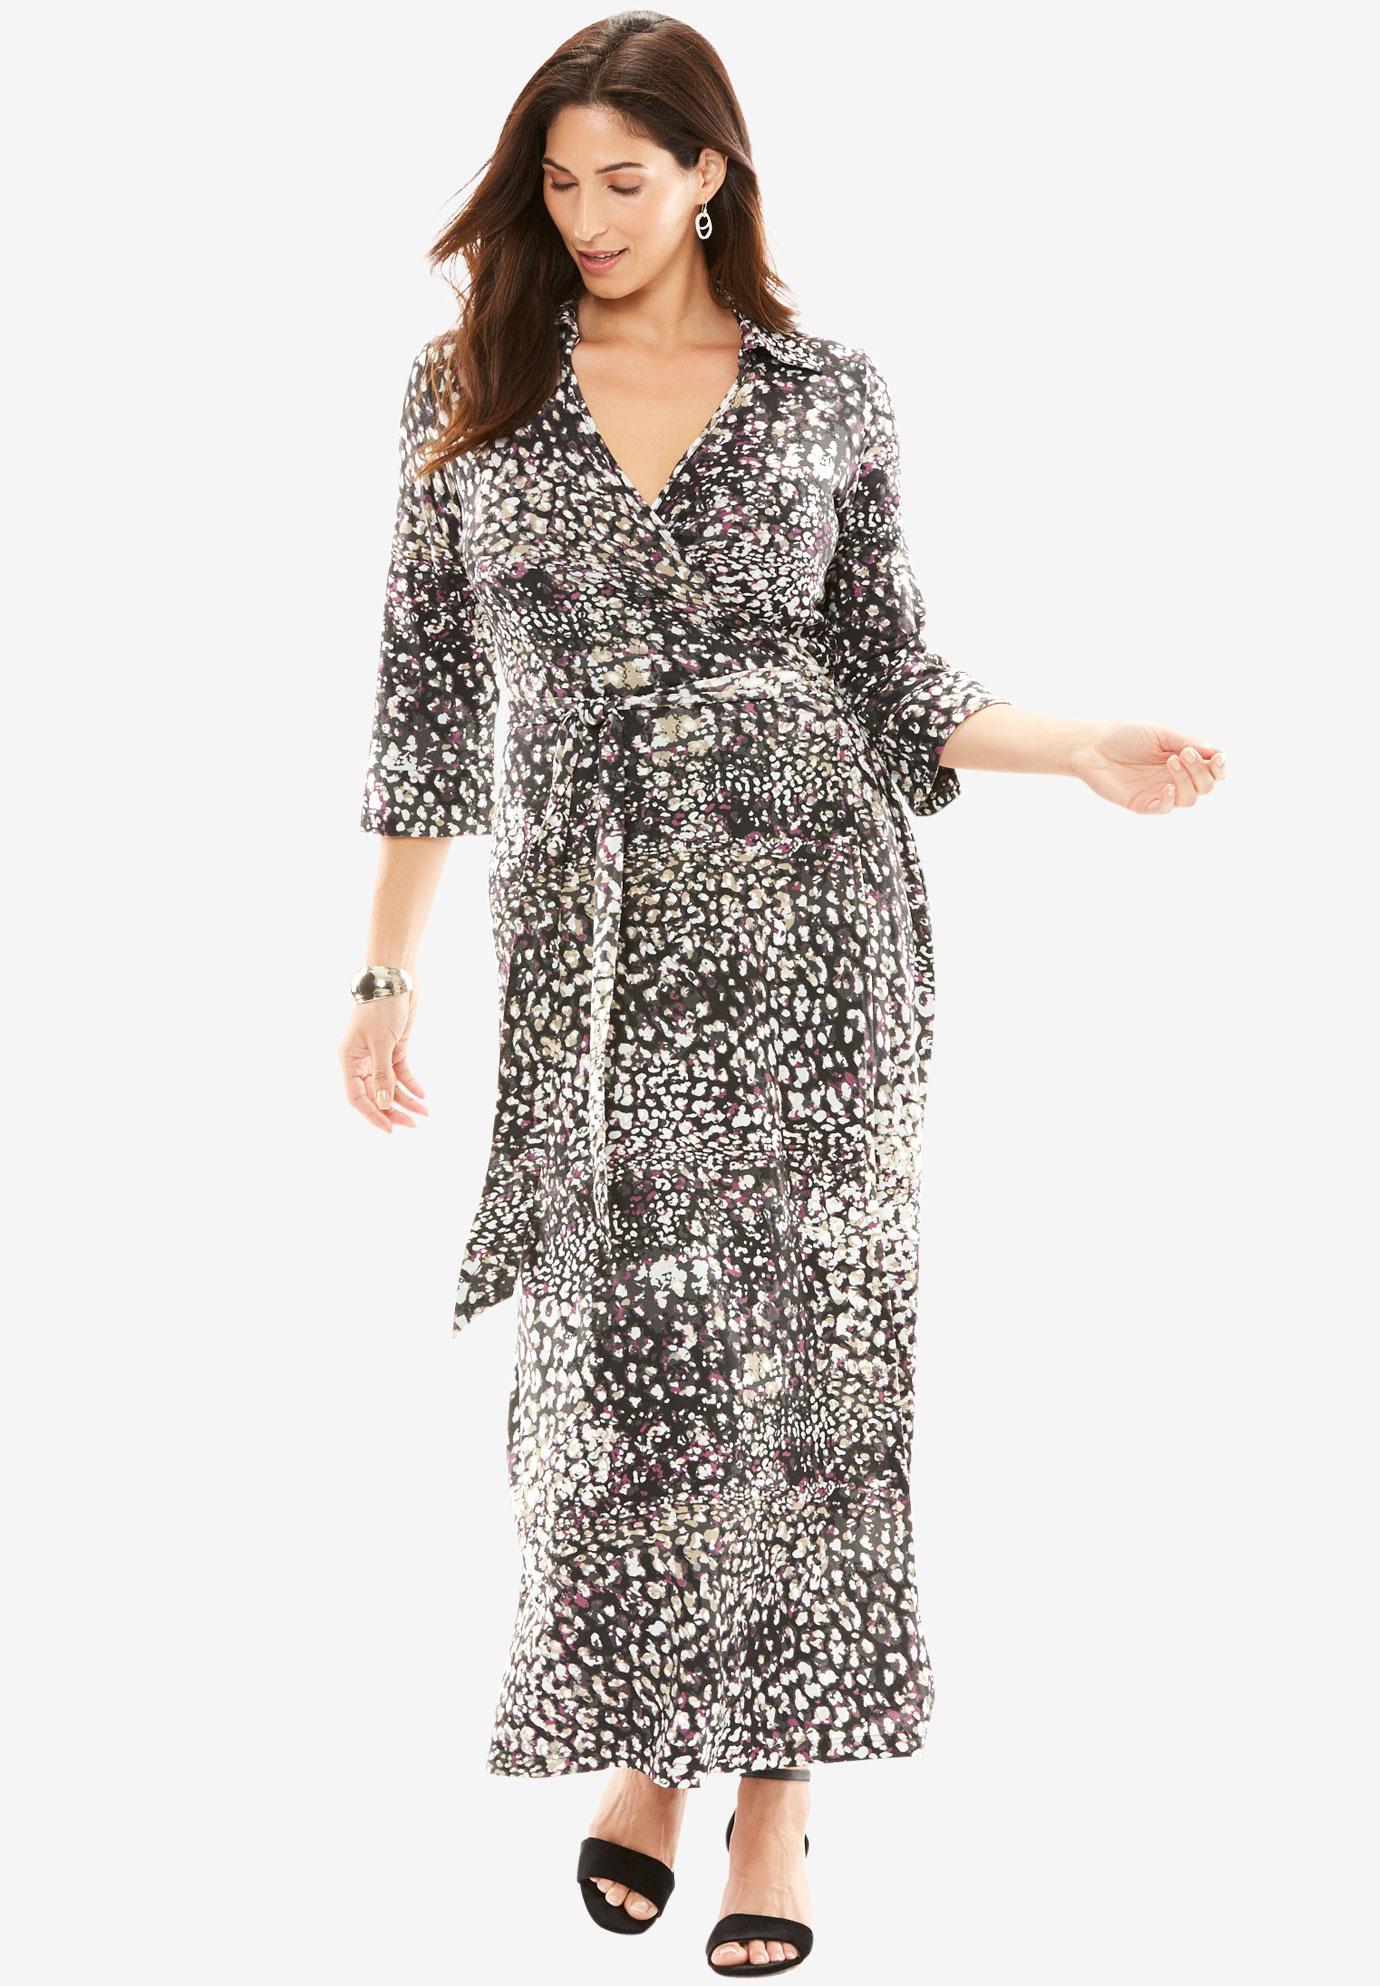 8722f20a67 Wrap Style Maxi Dress| Plus Size Career Dresses | Full Beauty